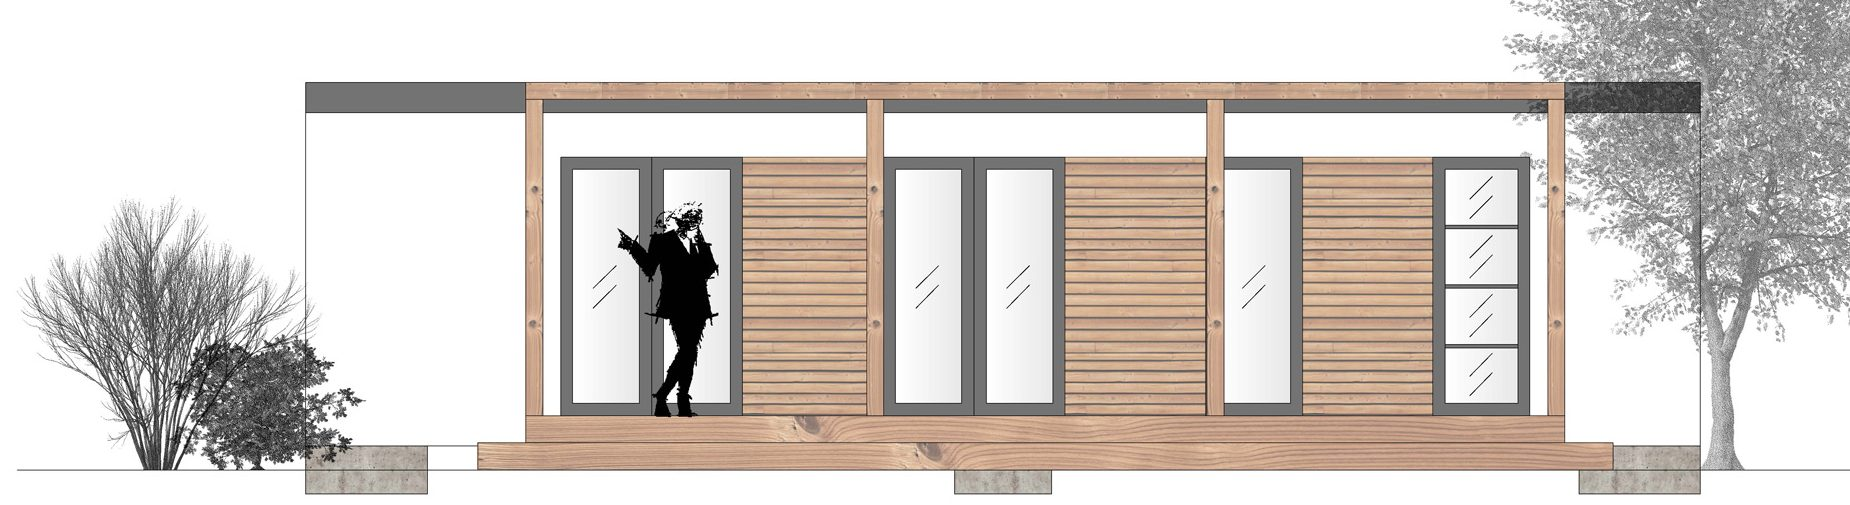 livingcon mobile wohncontainer aus holzbauweise. Black Bedroom Furniture Sets. Home Design Ideas